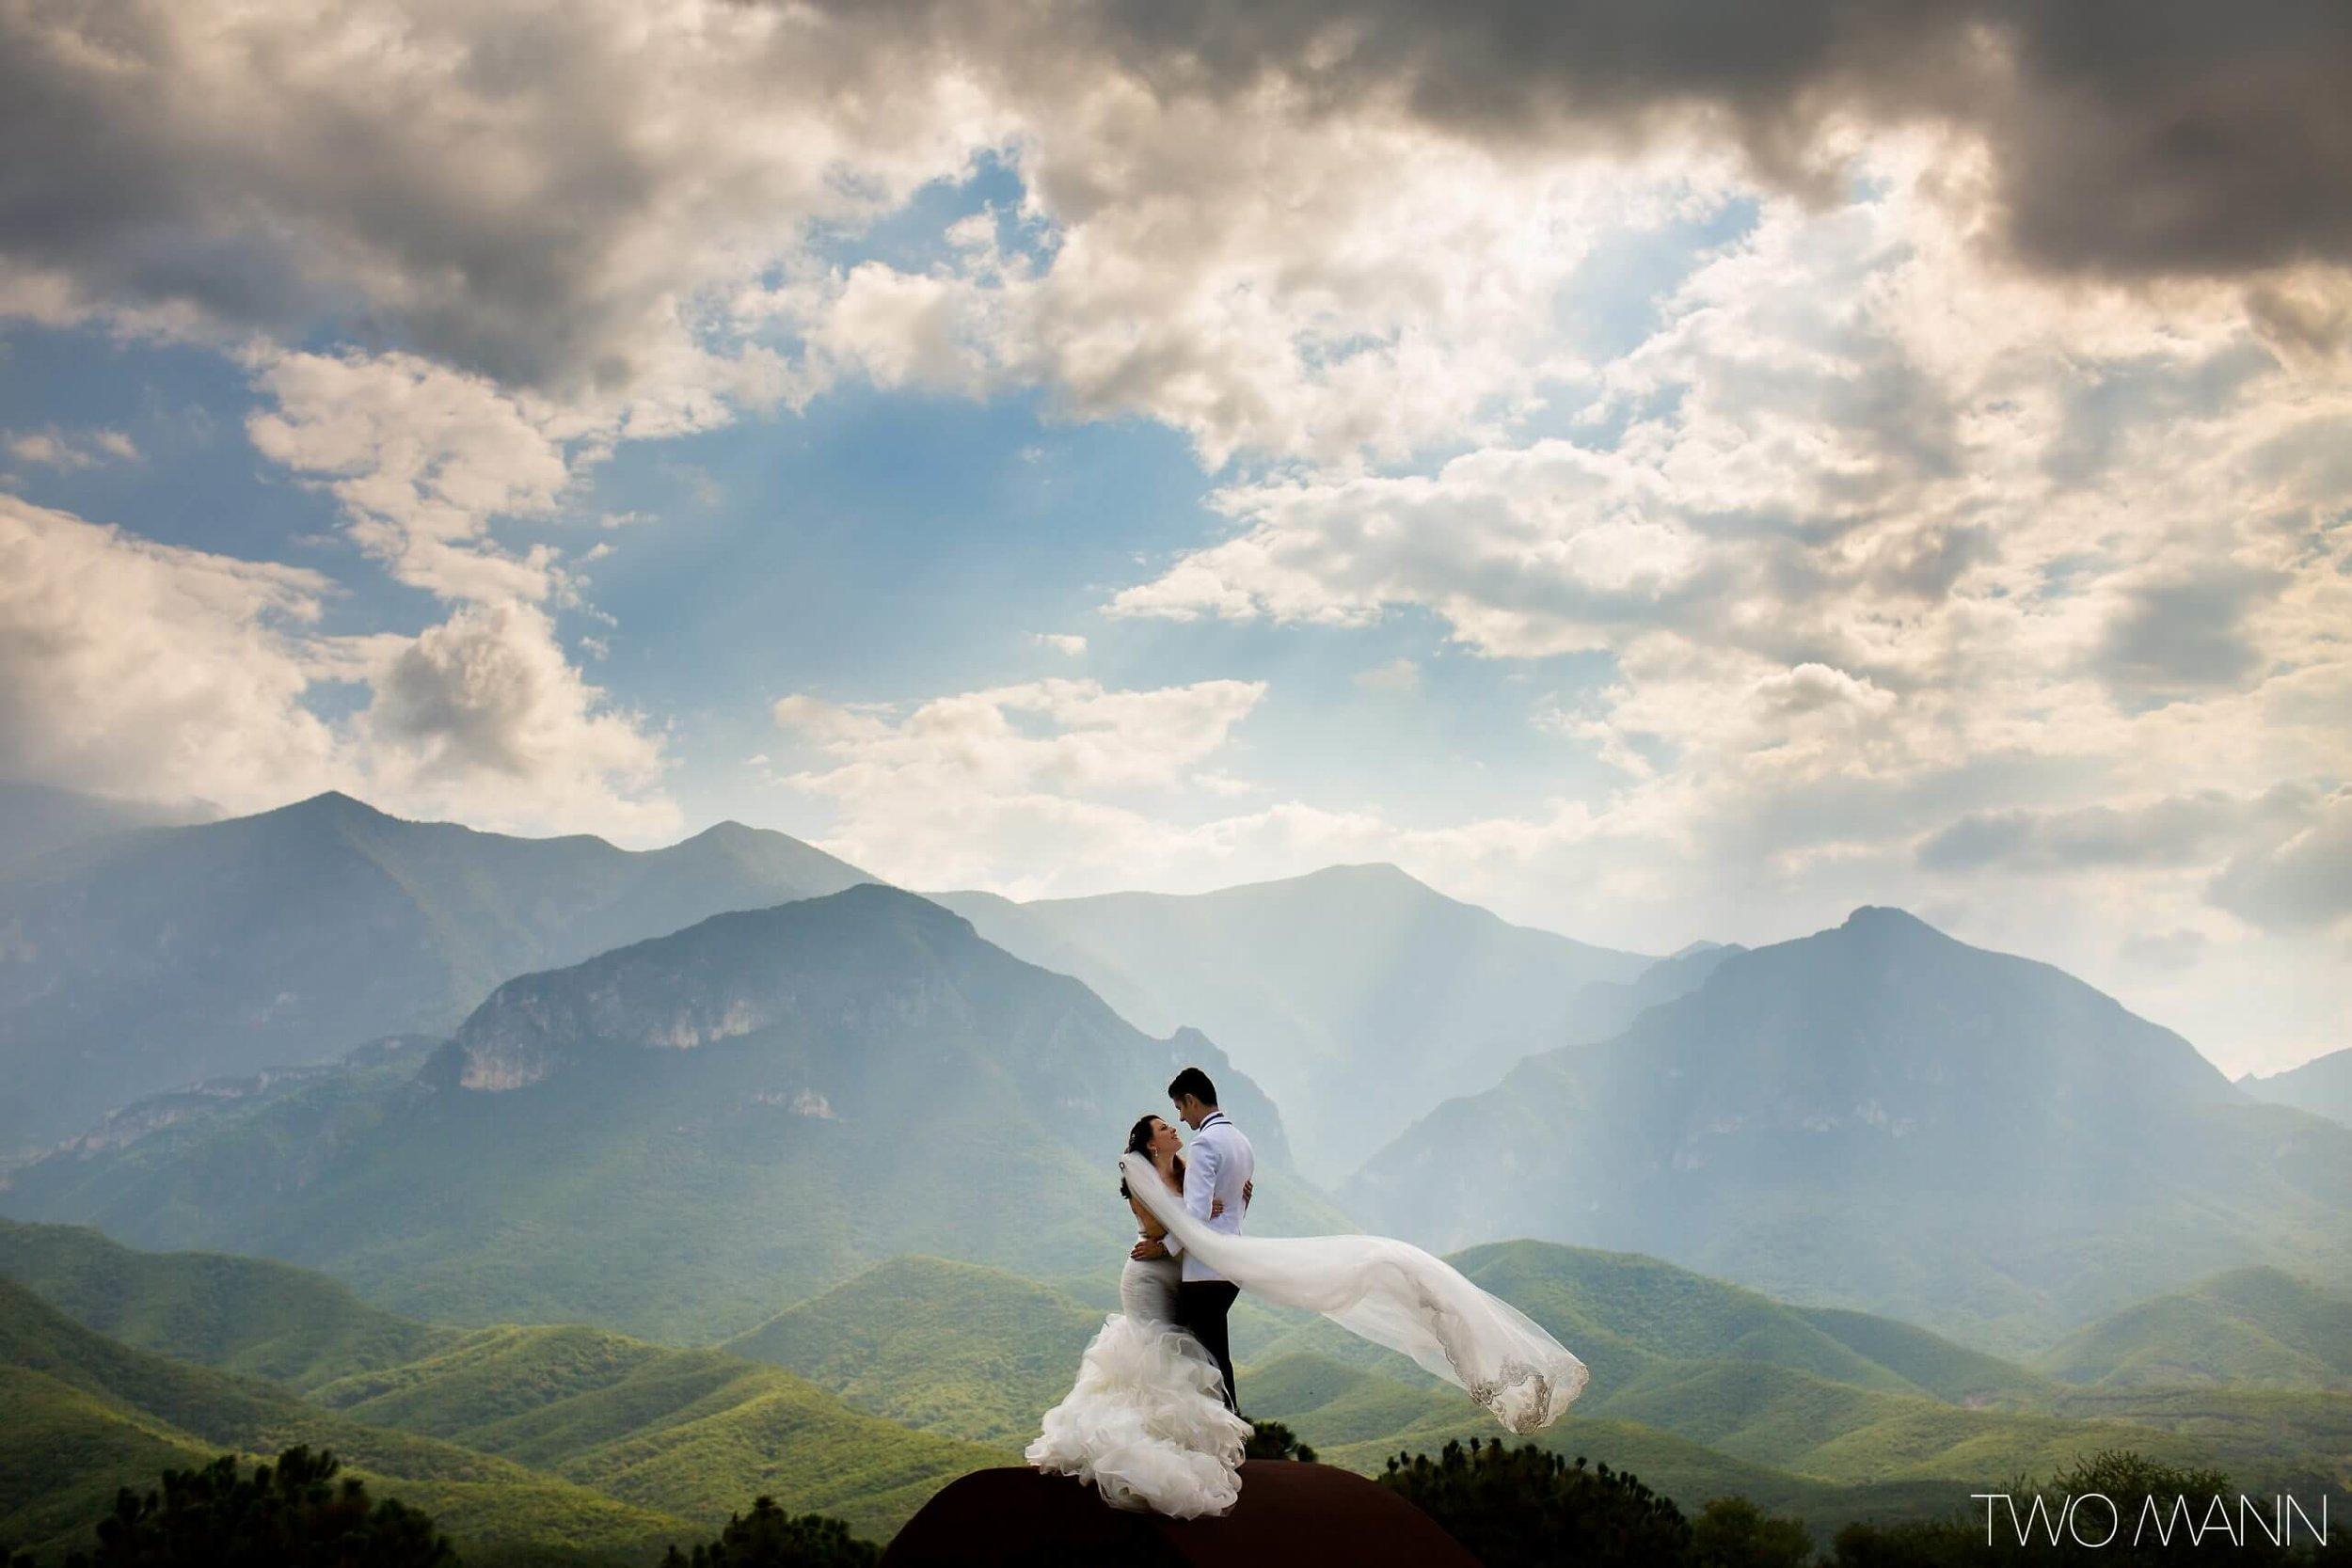 Two-Mann-Studios-Worlds-Best-Wedding-Photography-Best-of-2016-048-2560x1707.jpg